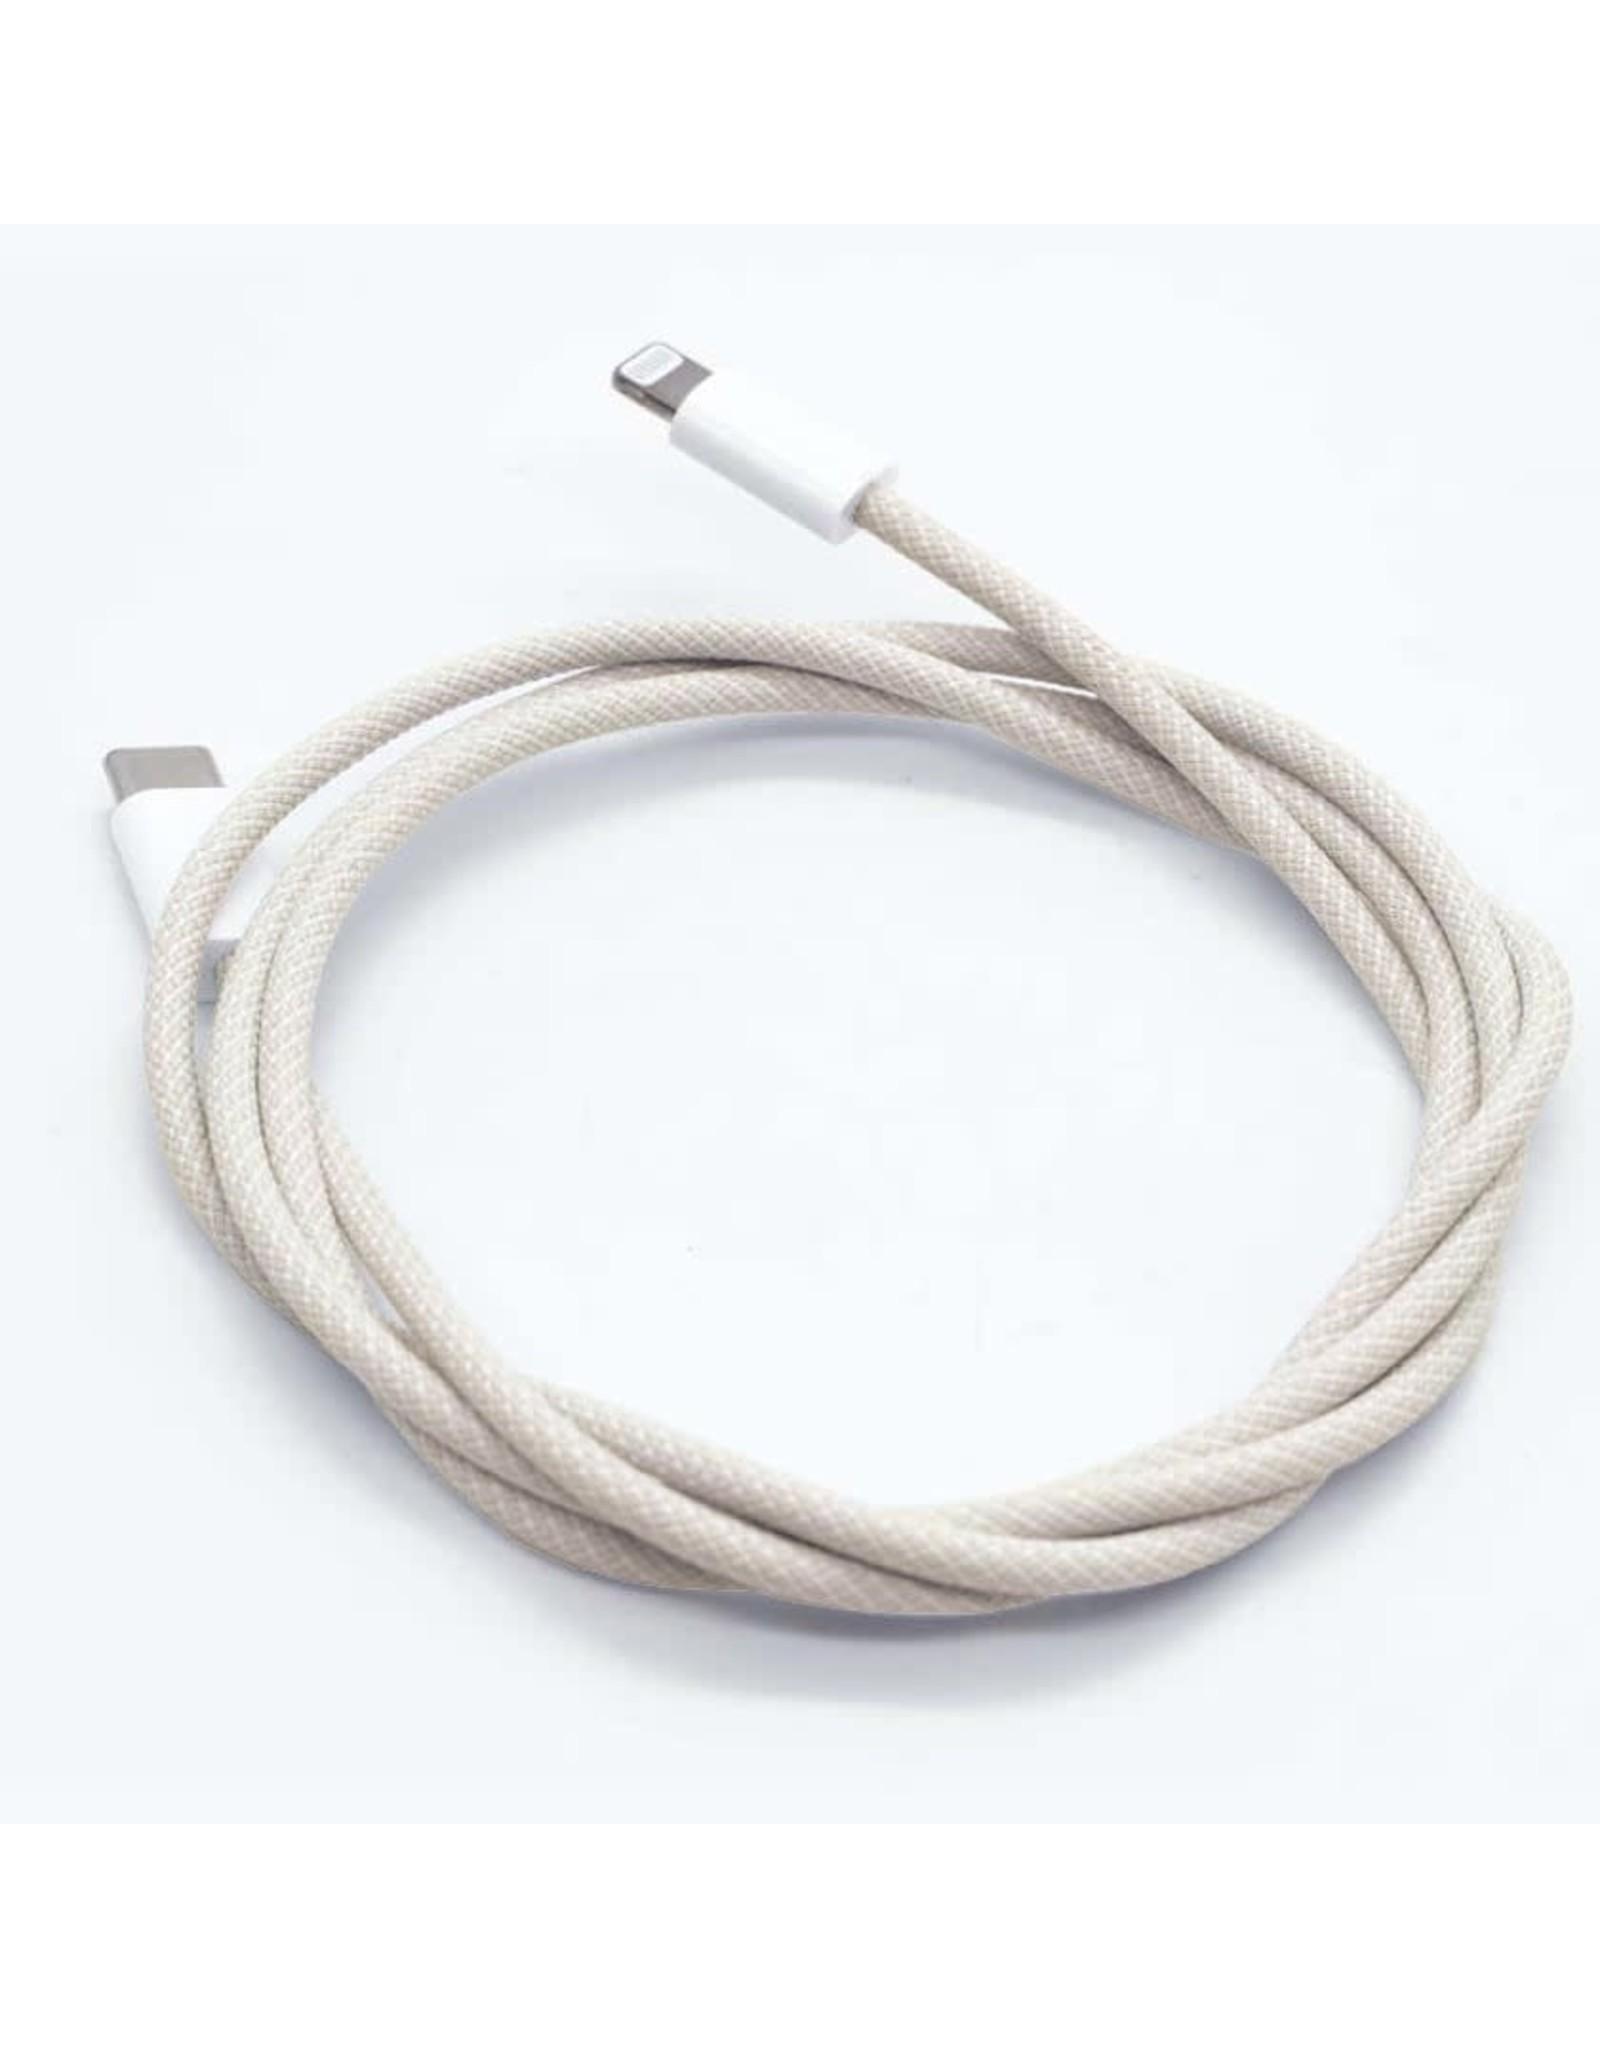 Apple Apple USB-C to Lightning Cable, 1m,